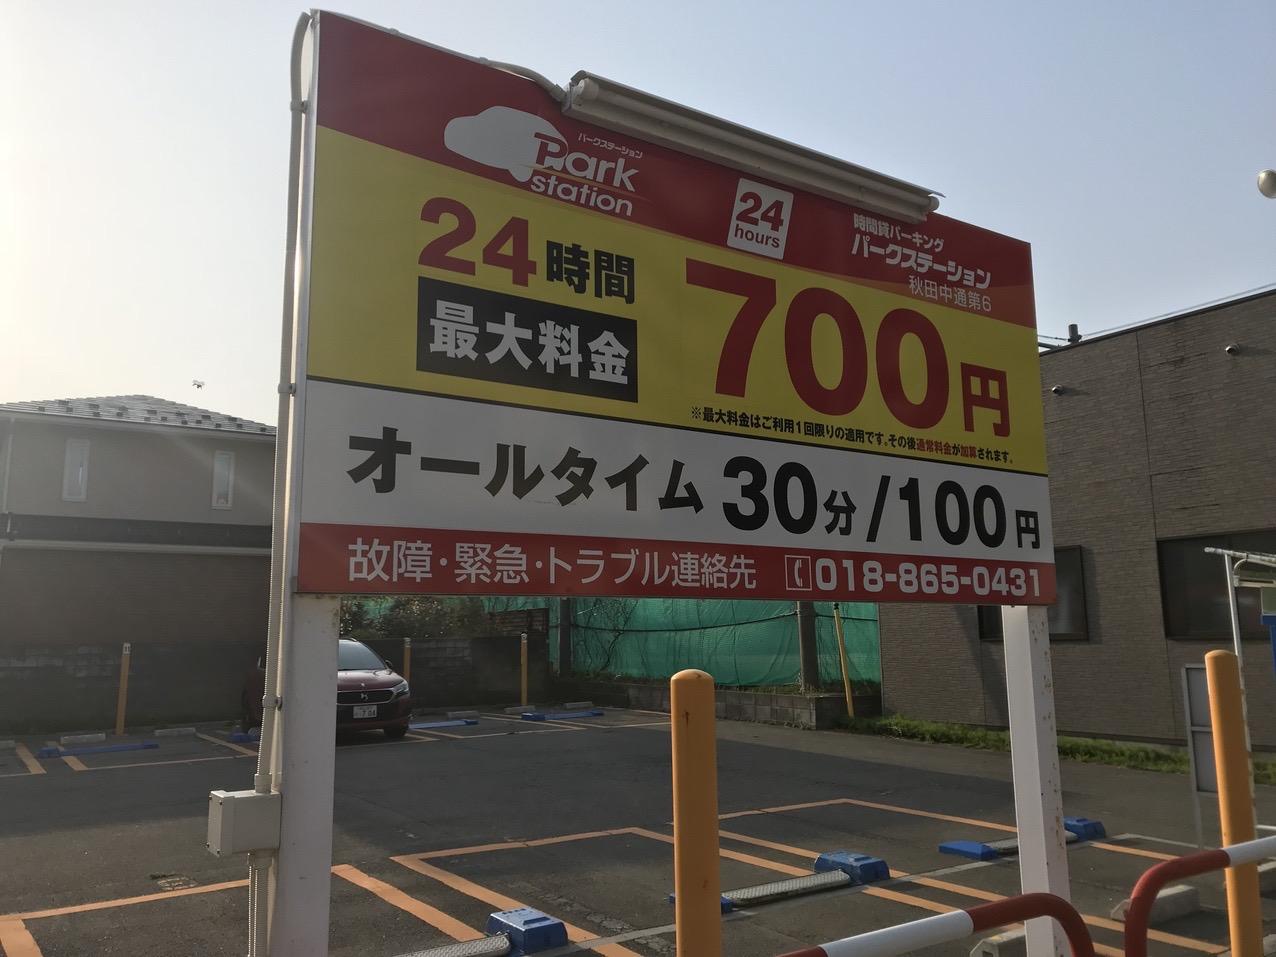 Hirosaki hanaikada 201843